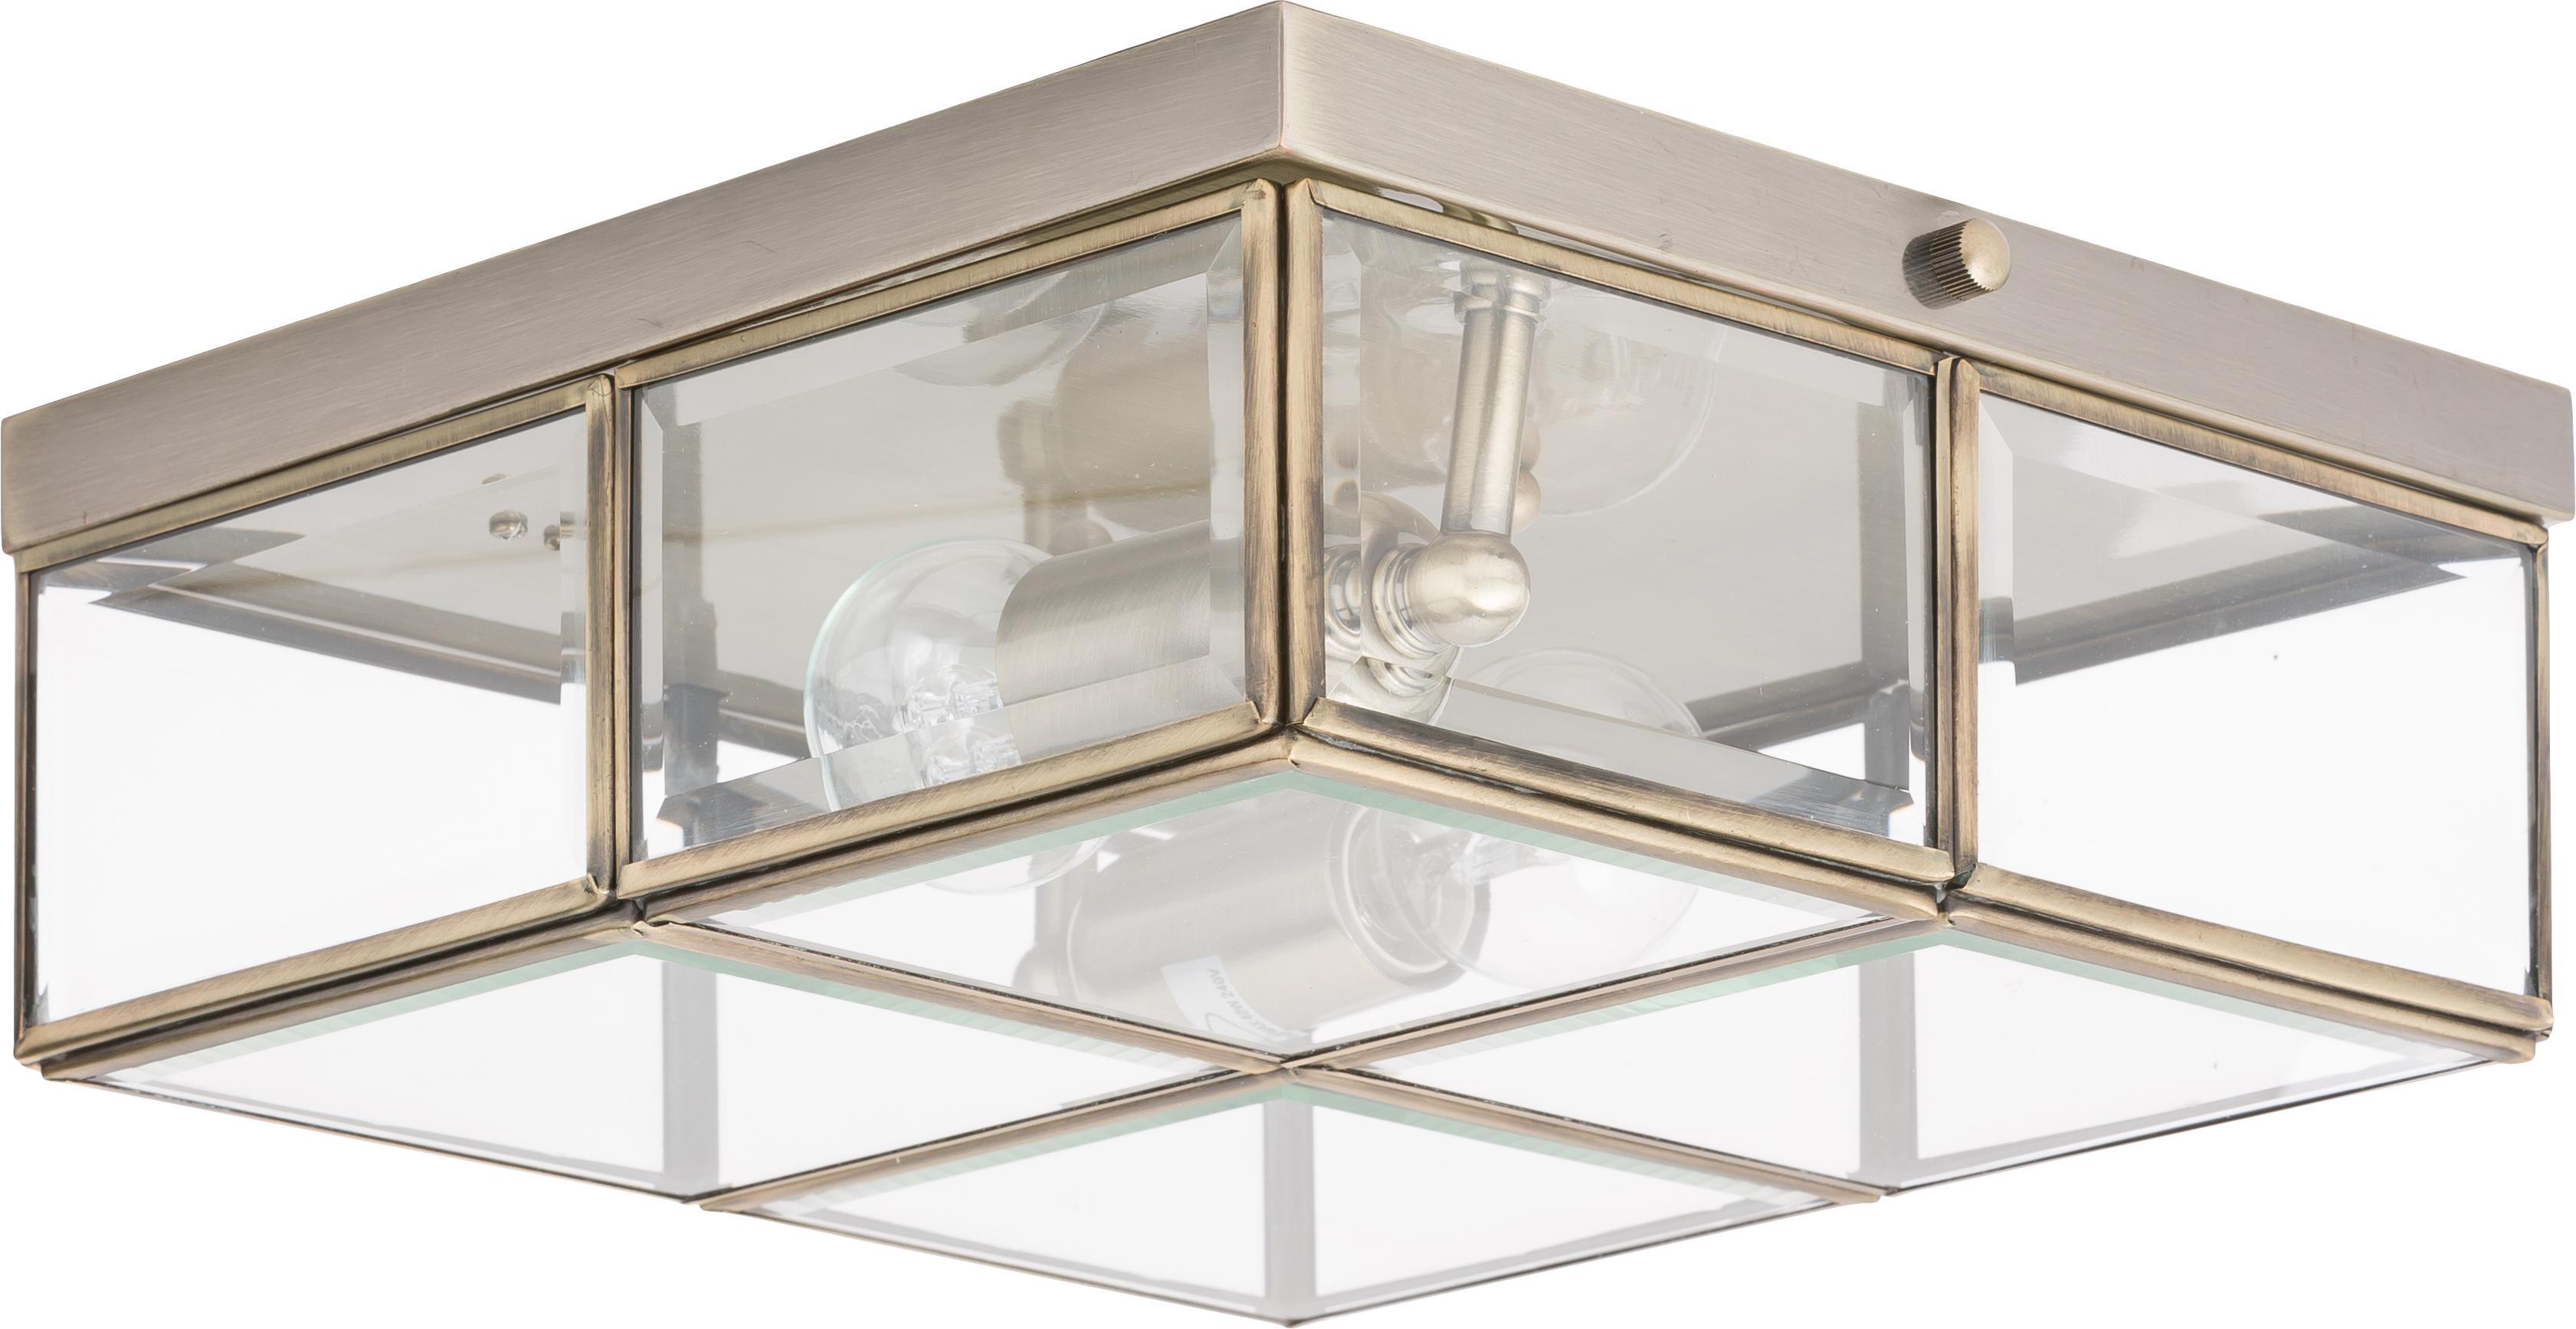 Moderne plafondlamp Ben, Messingkleurig, transparant, 26 x 10 cm